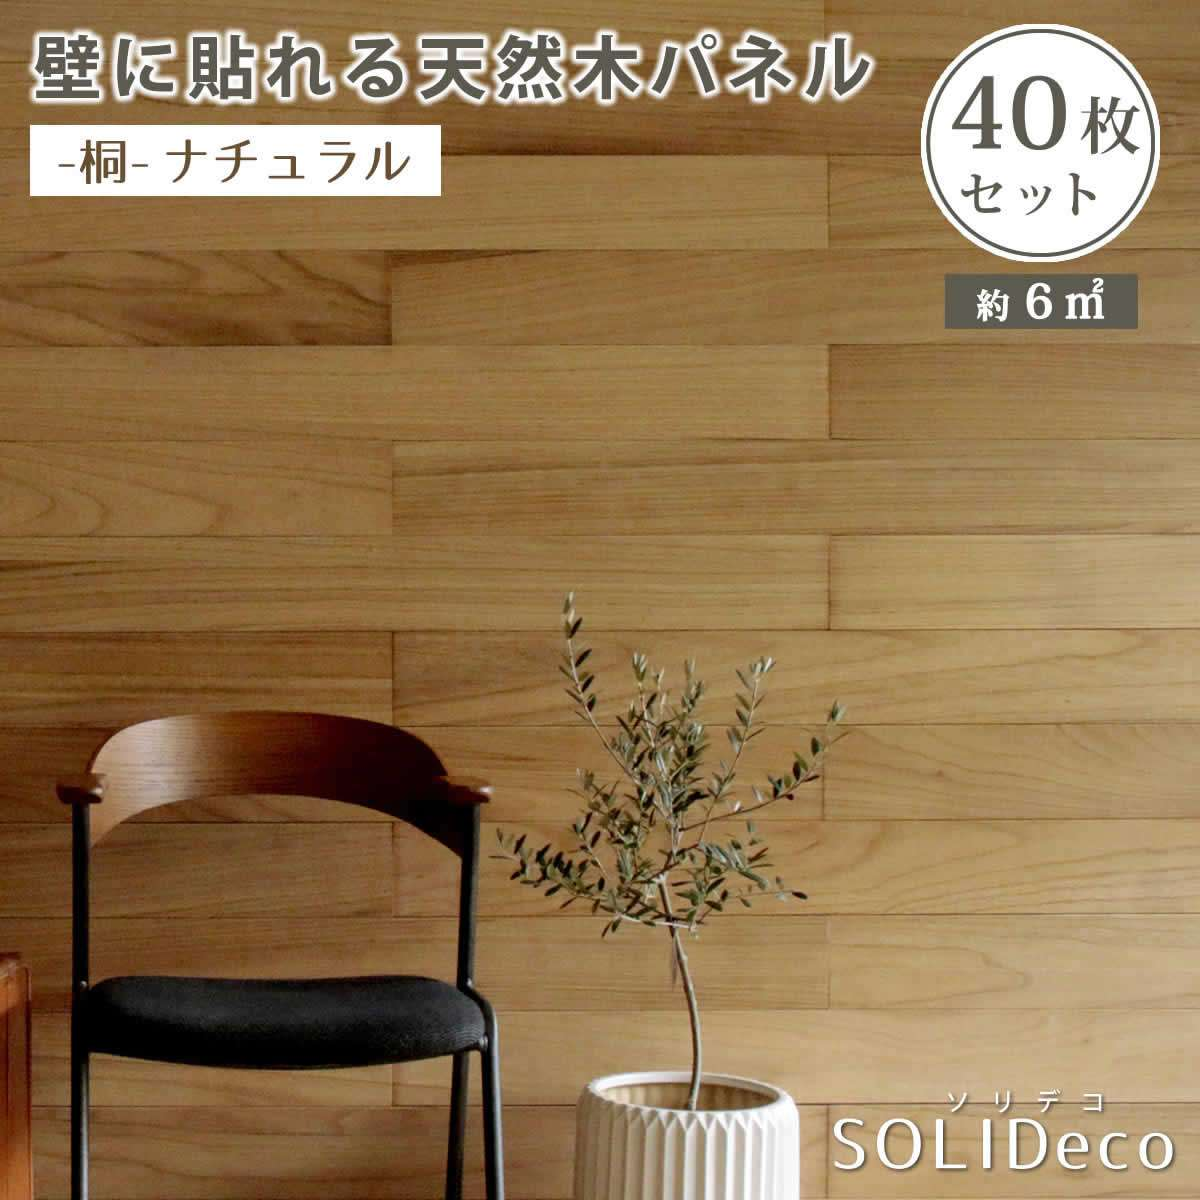 SOLIDECO 壁に貼れる天然木パネル 40枚組(約6m2) SLDC-40P-001KRI【壁パネル ウォールパネル ウッドパネル DIY 壁紙】